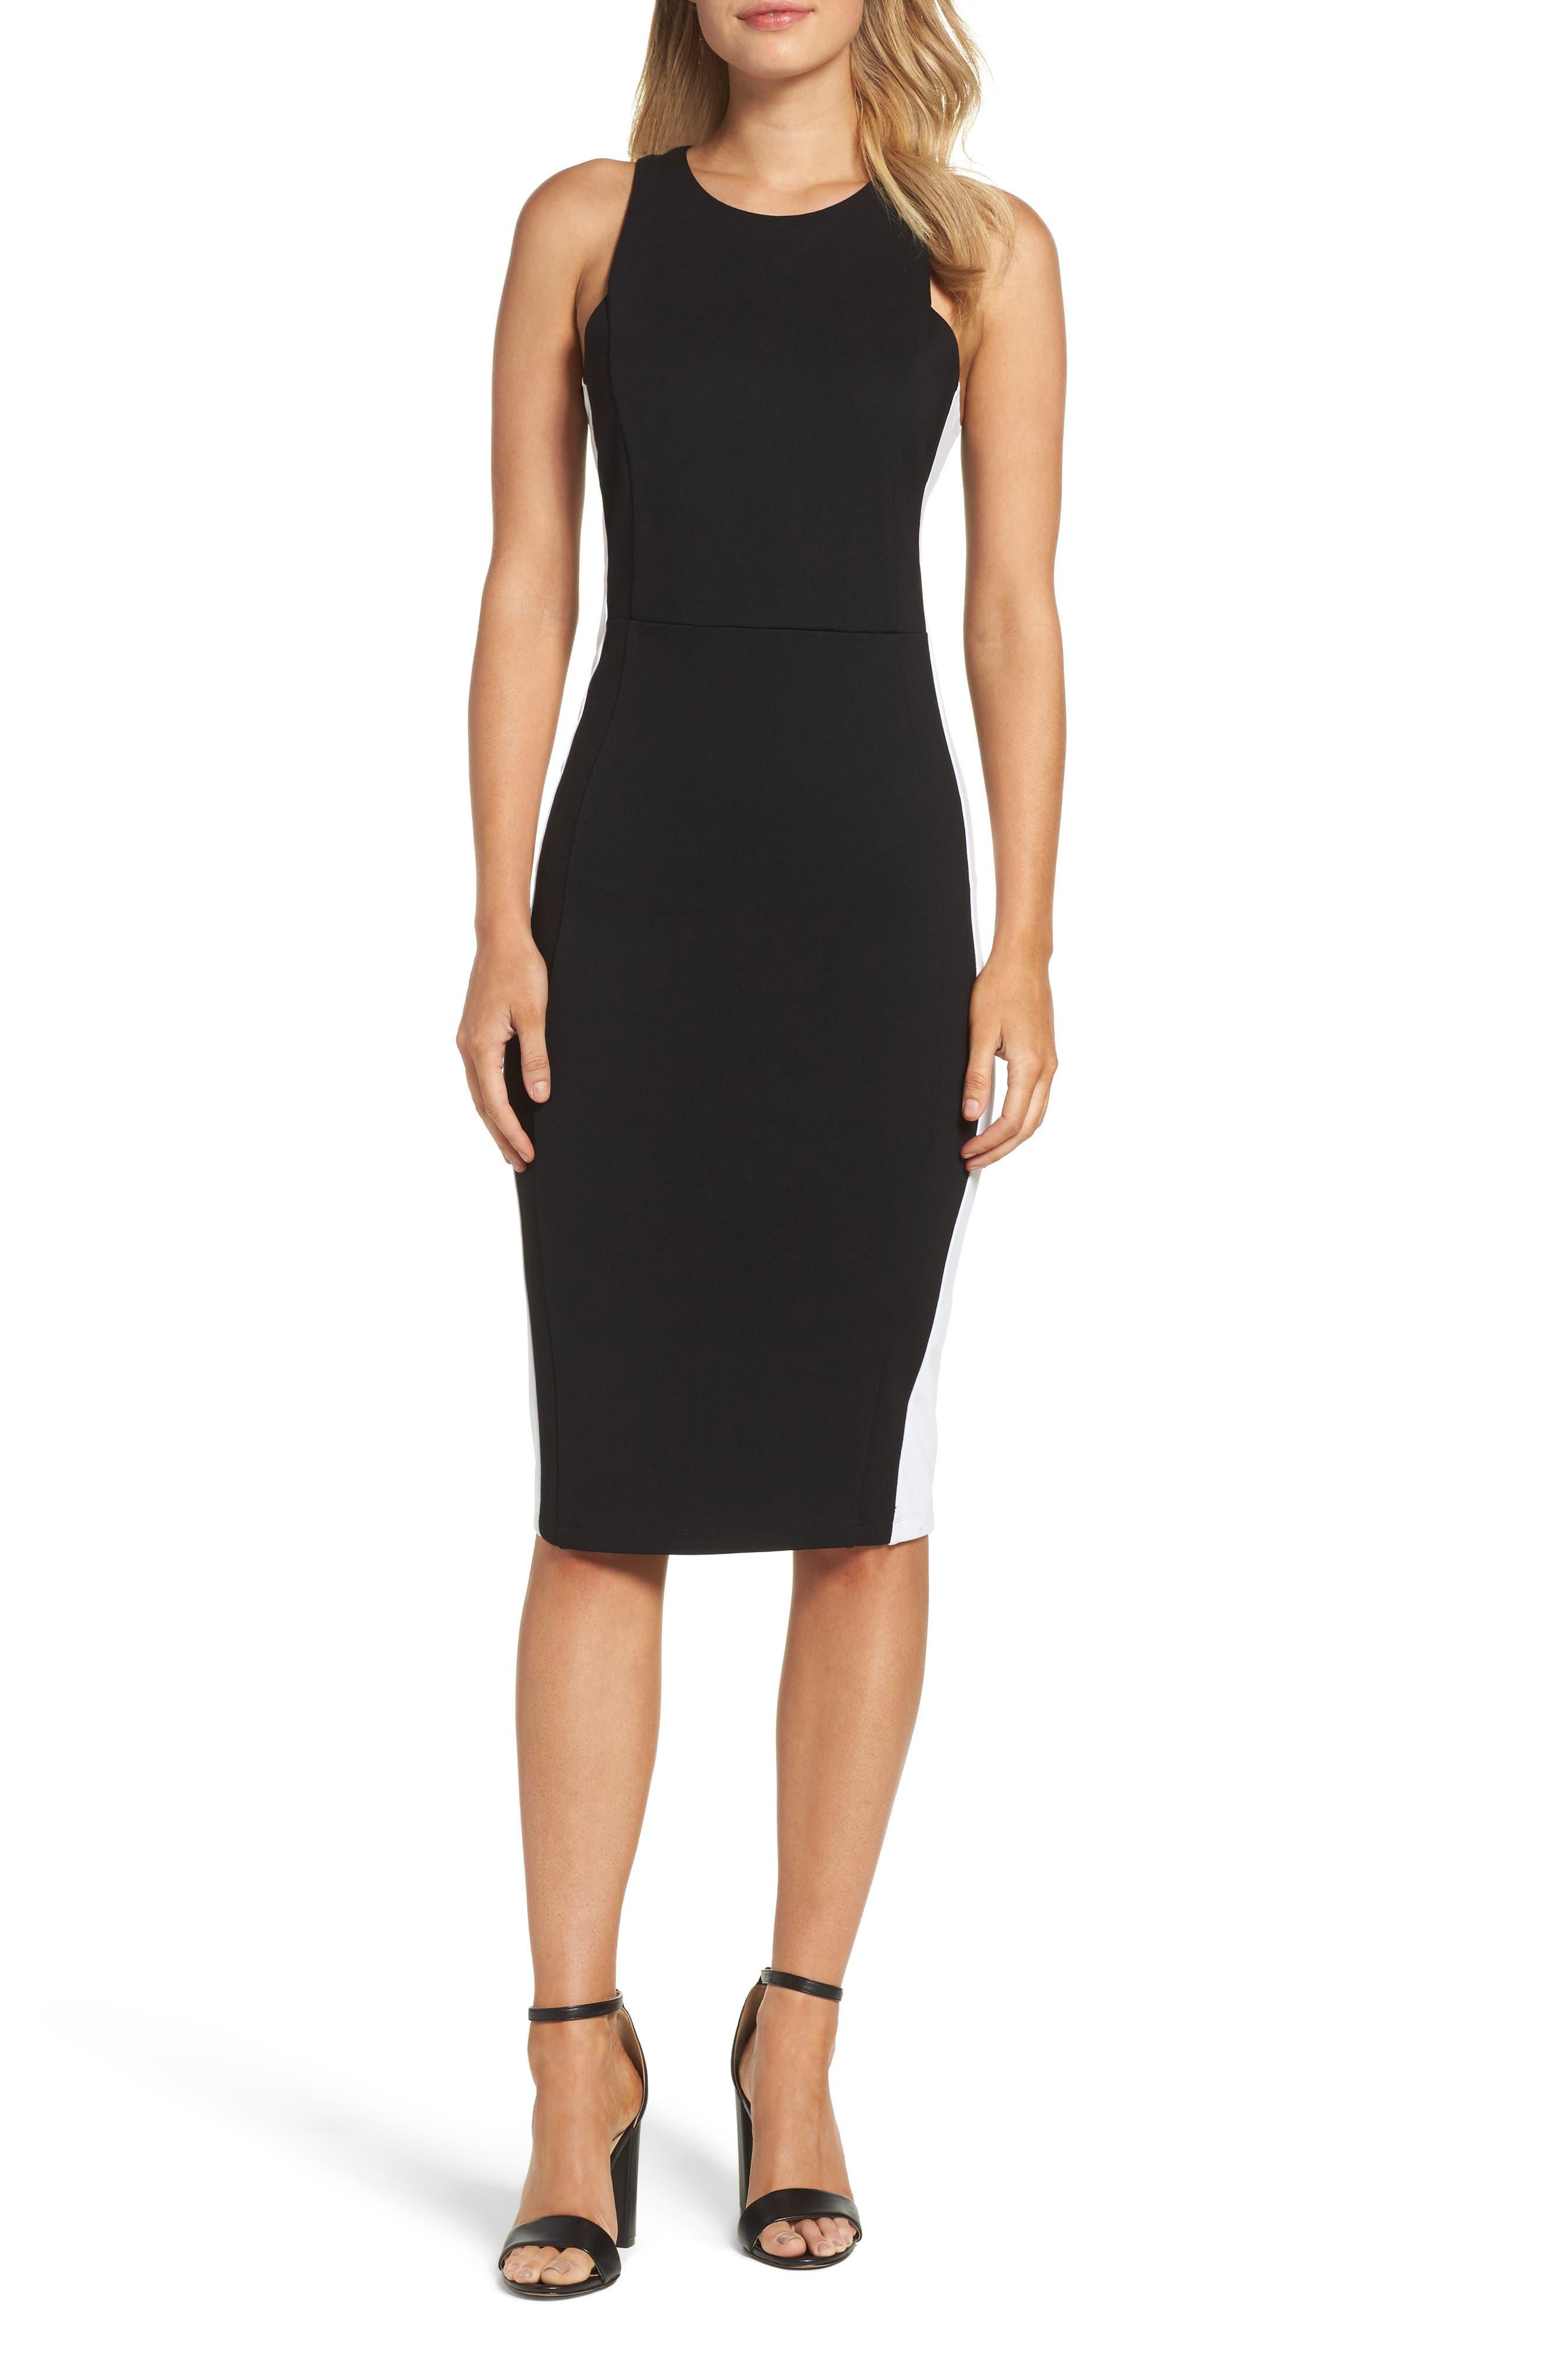 Alternate Image 1 Selected - Felicity & Coco Orlanda Ponte Knit Sheath Dress (Nordstrom Exclusive)